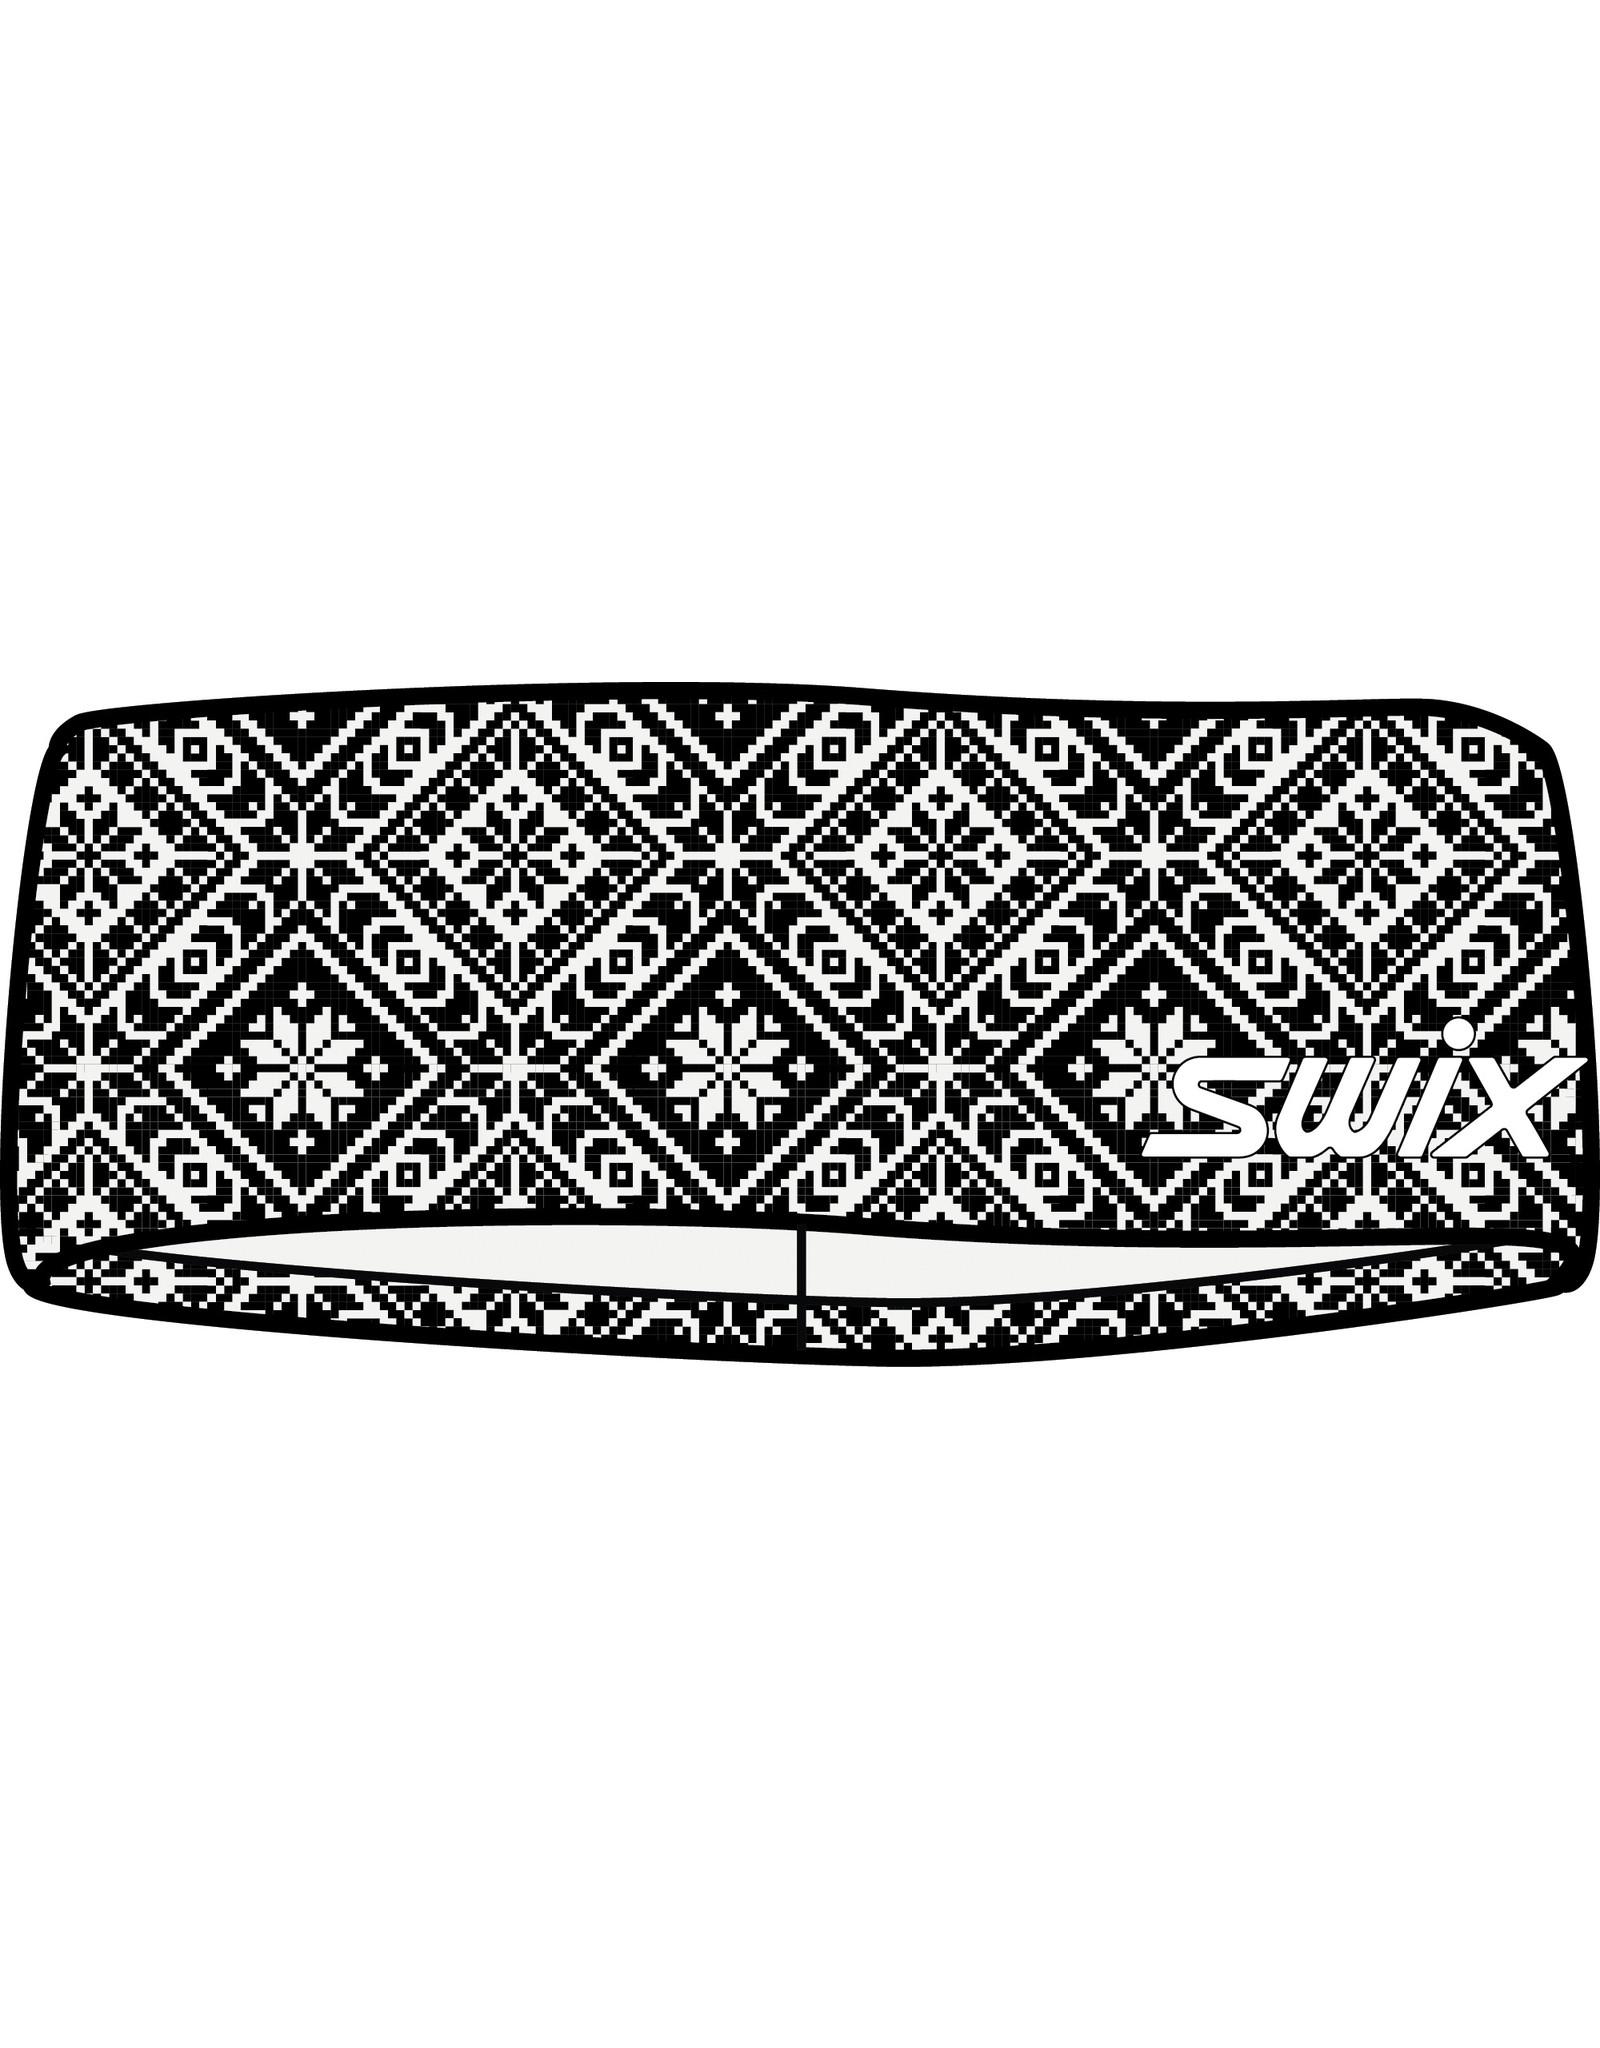 Swix Myrene Headband Black/White Print